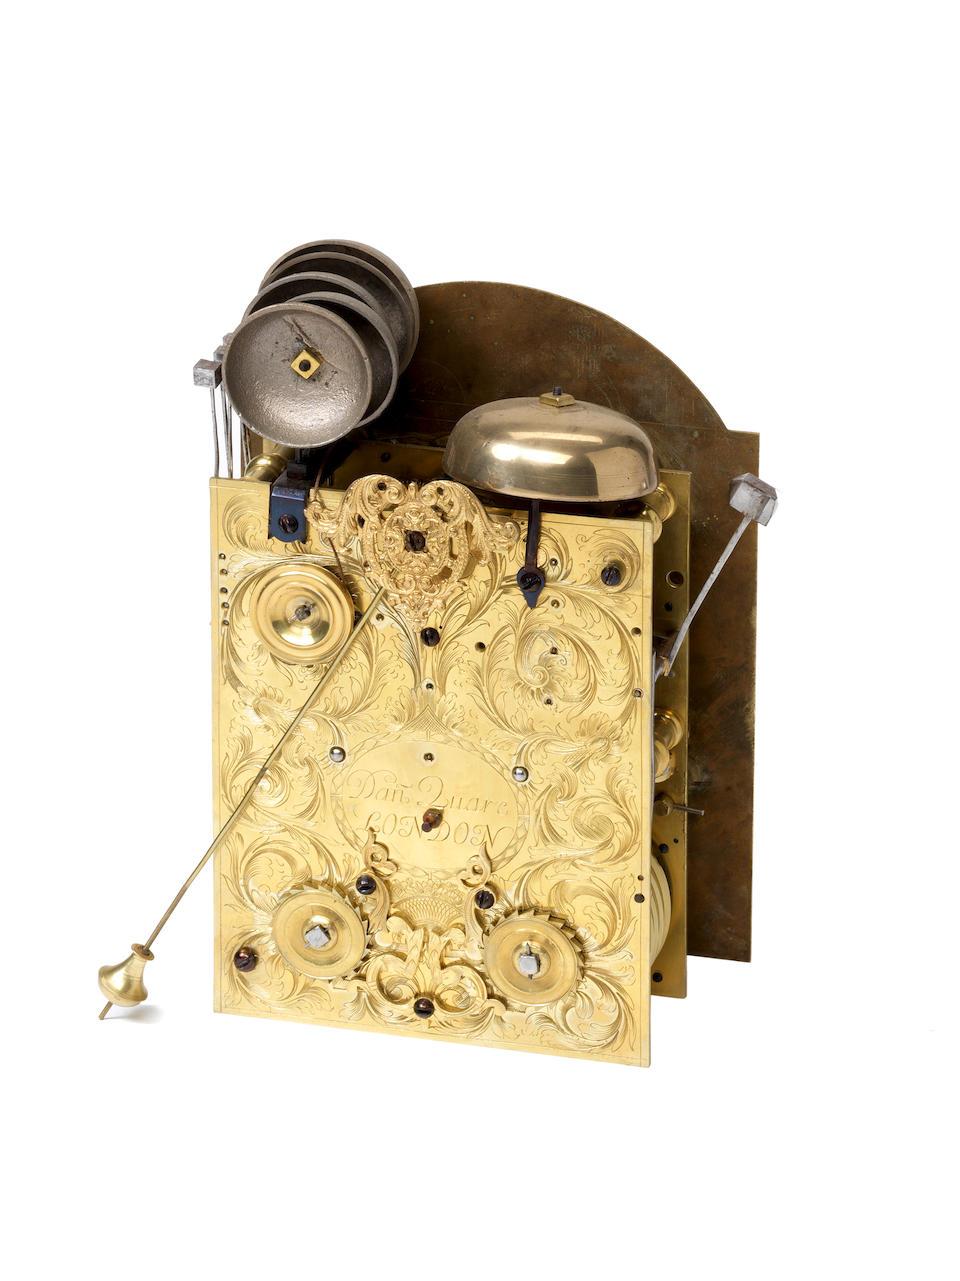 A fine and rare late 17th century ebony veneered quarter repeating double basket top bracket clock Daniel Quare, London